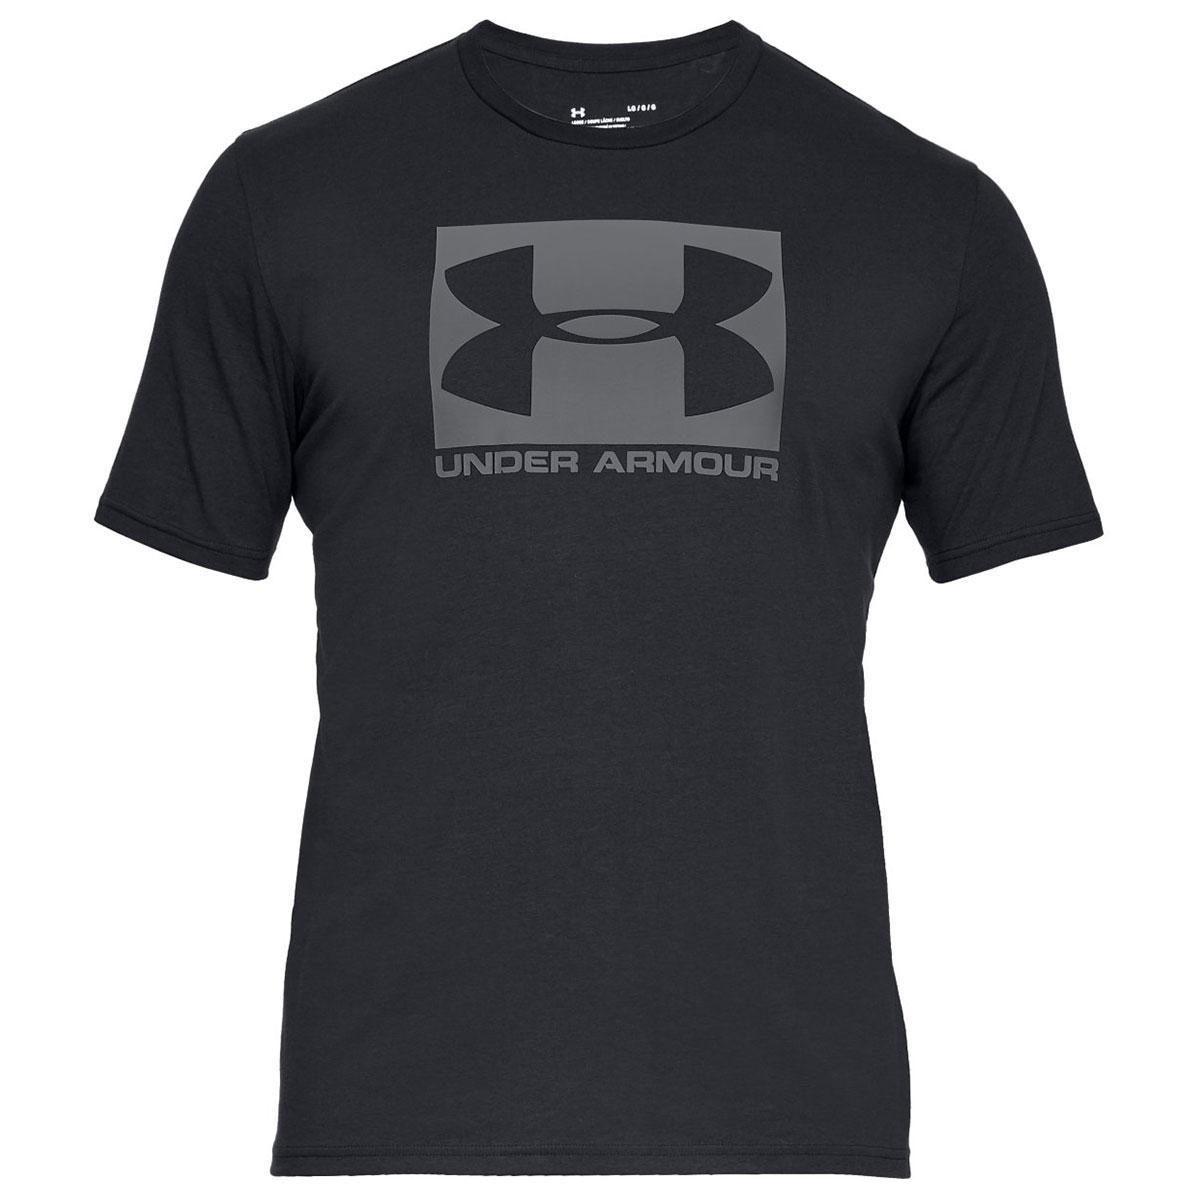 Under-Armour-Mens-2019-UA-Boxed-Sportstyle-HeatGear-Training-Gym-T-Shirt-Tee thumbnail 8